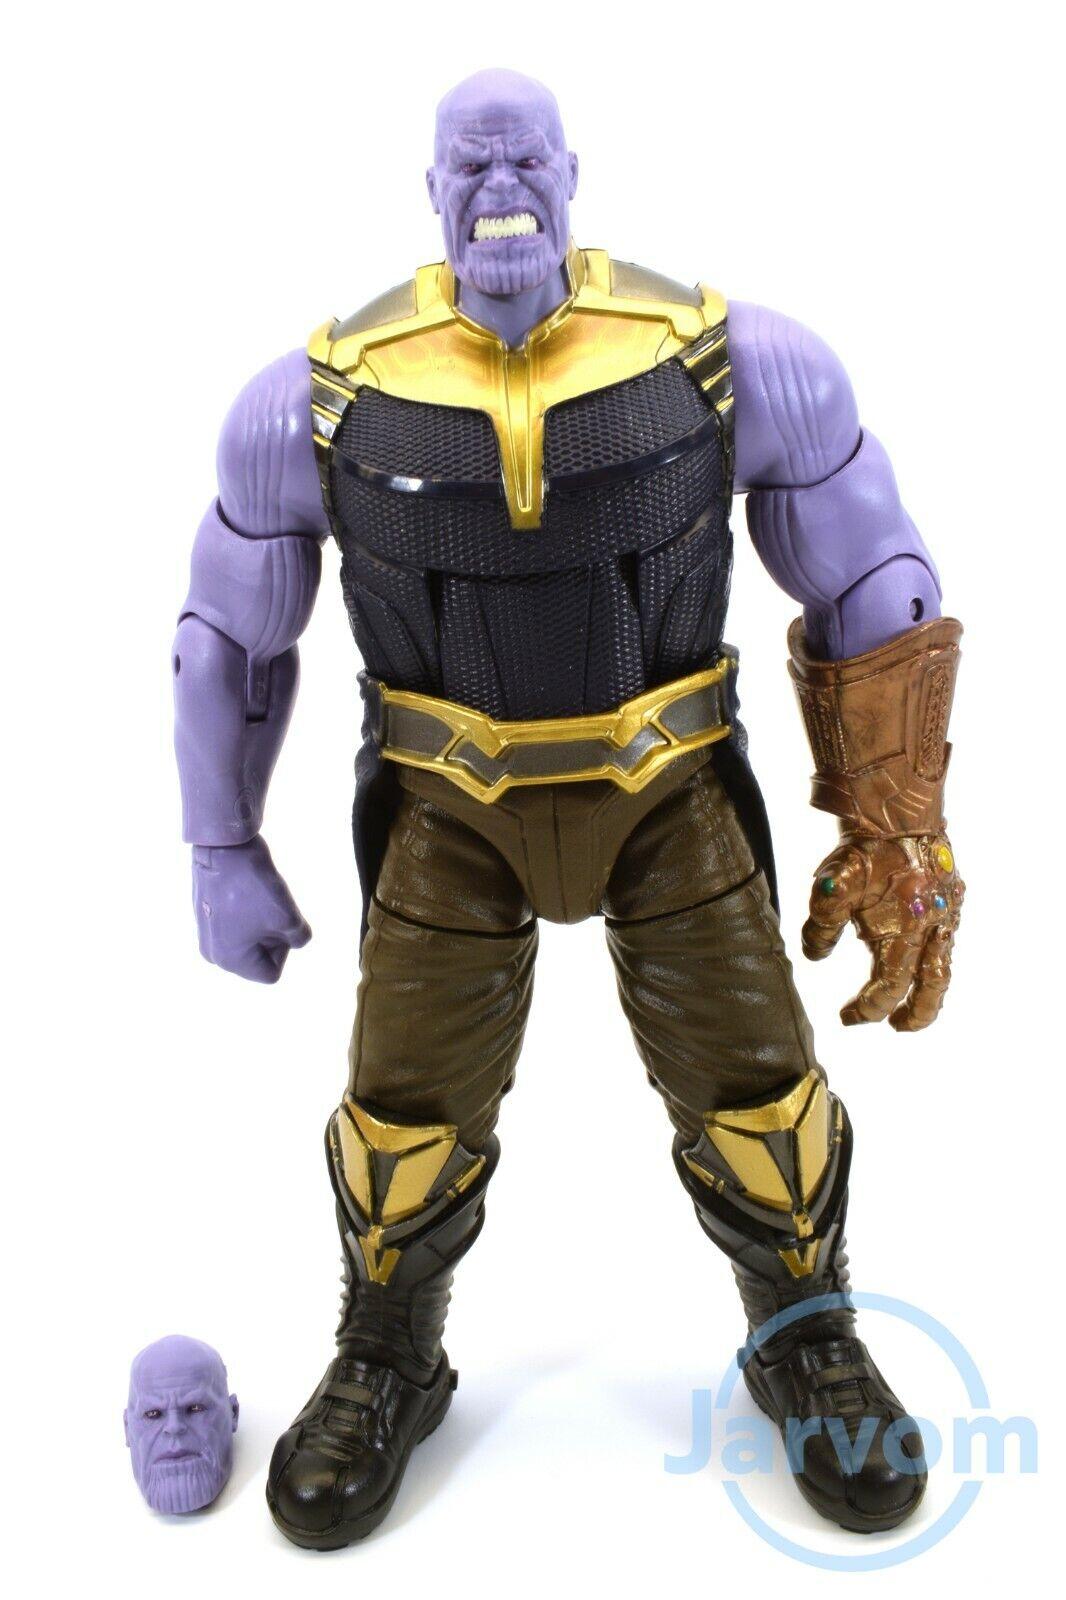 Marvel Leggende 6  Pollici Studios 10th Anno 3Pack Infinito Thanos Sciolto